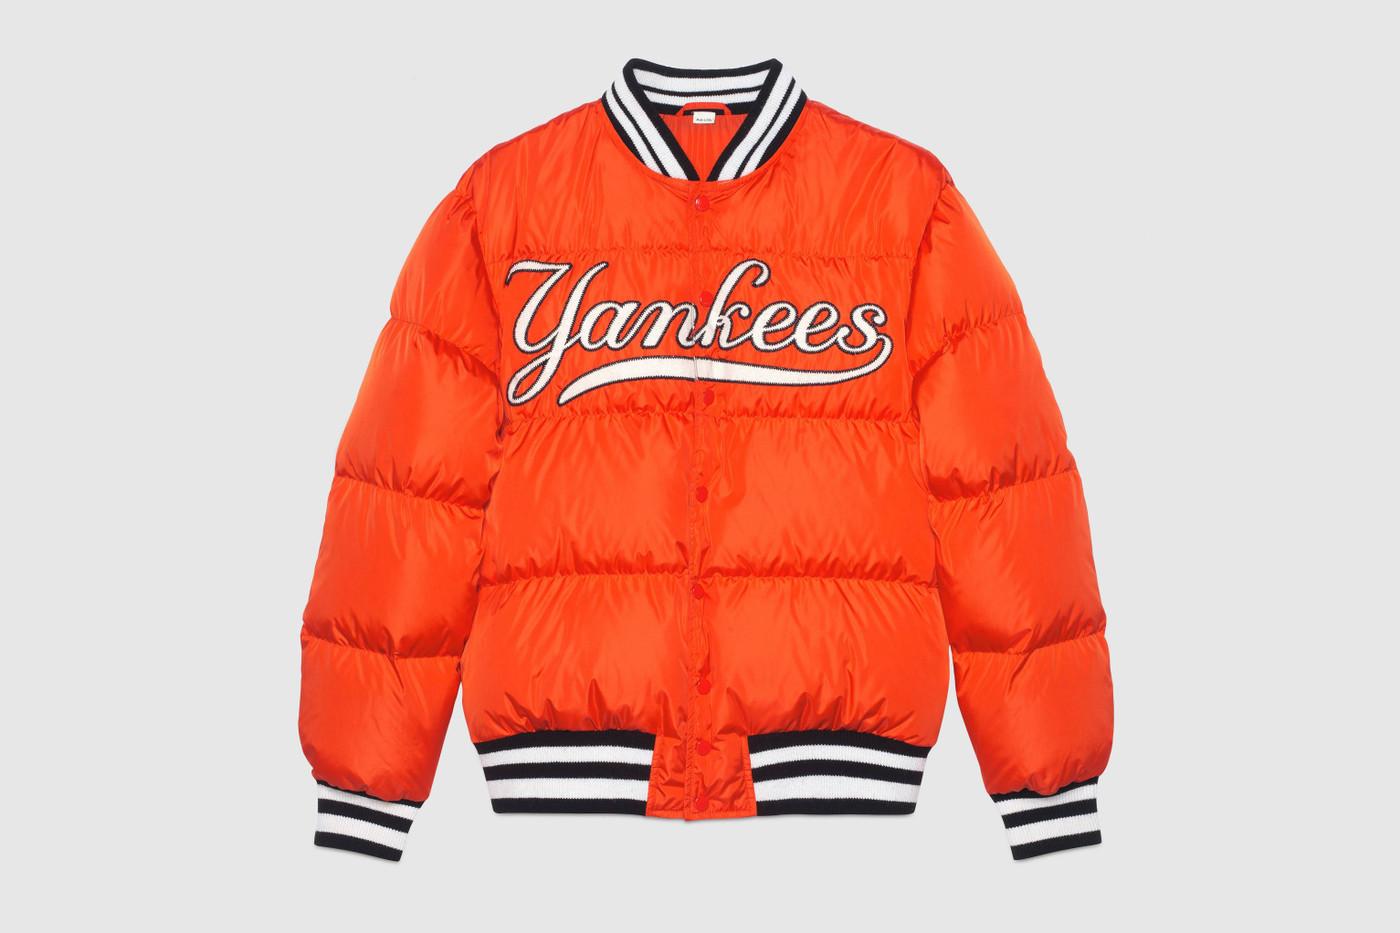 yankees-gucci-apparel-3 – Copy